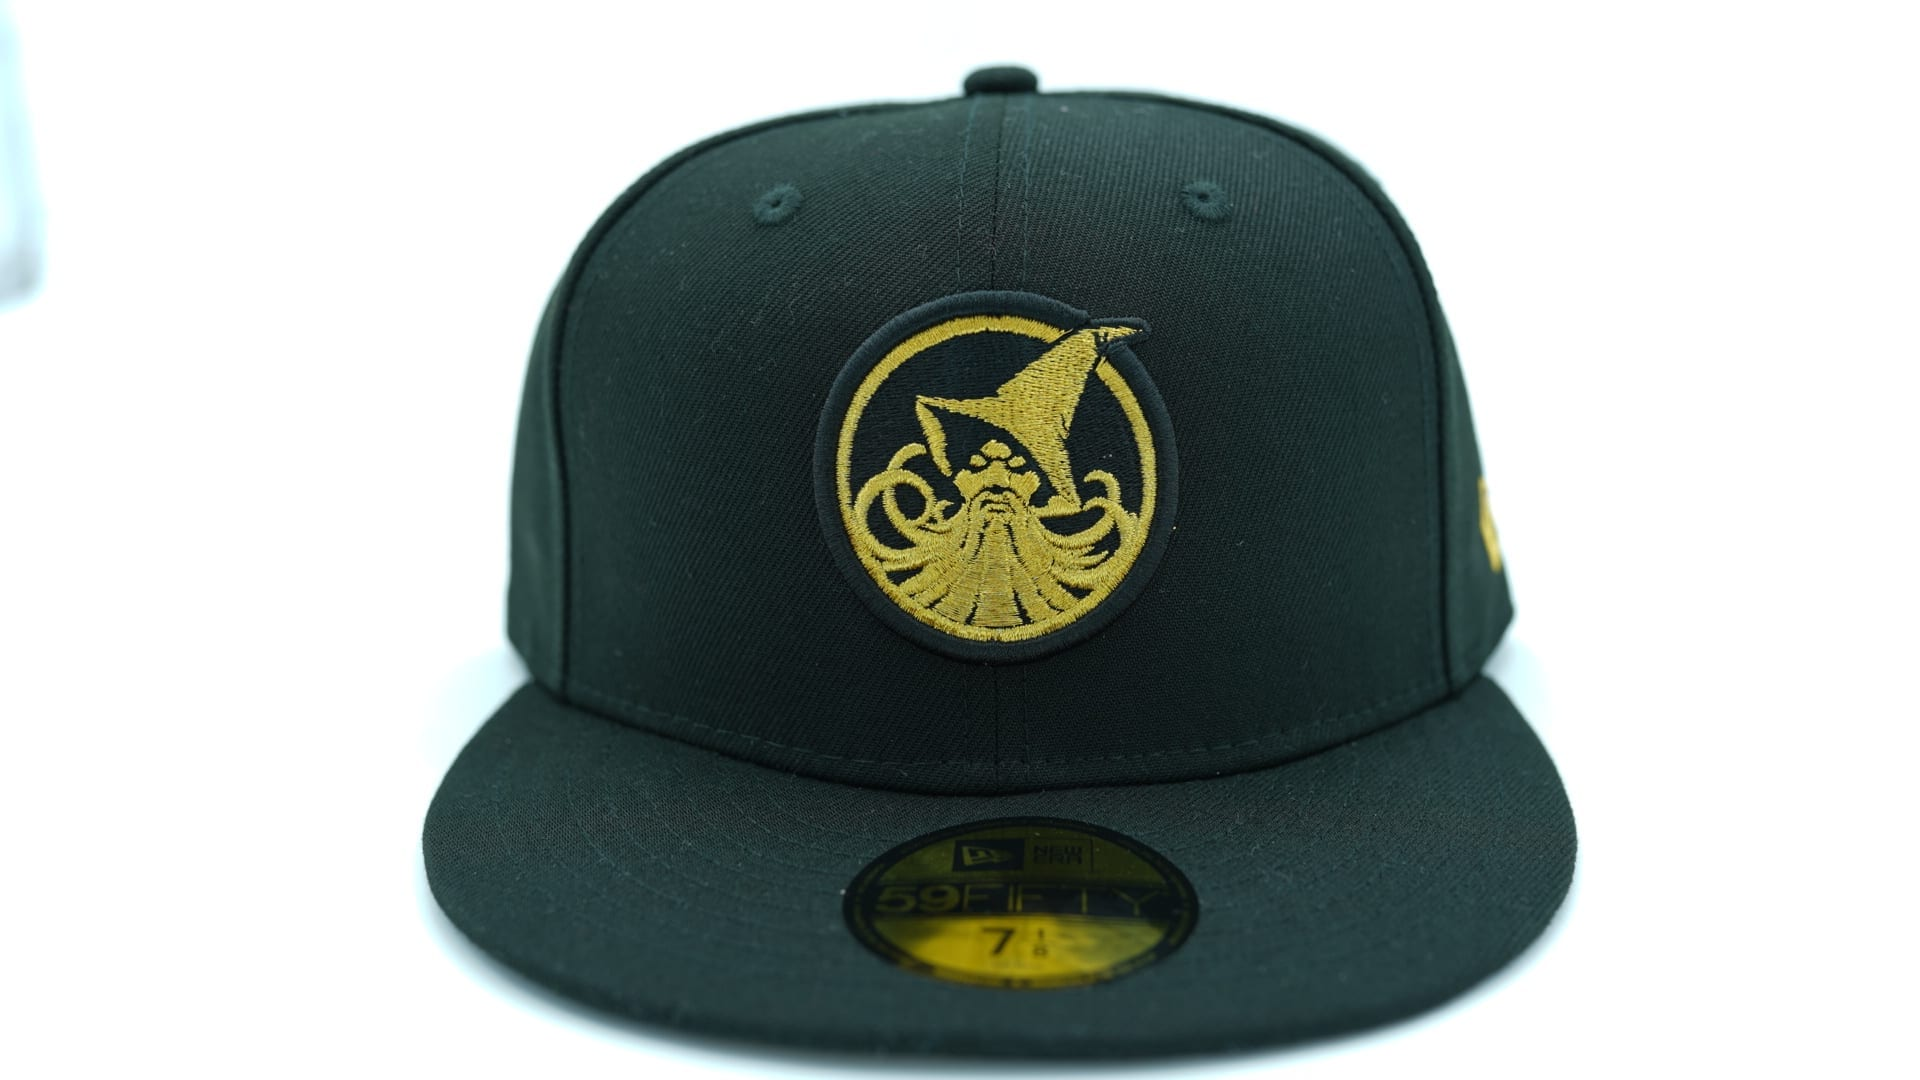 ... Praying Hands New Era 59Fifty Fitted Hat (Gray Under Brim)  amazing  price 80b7c adfff Birmingham Barons New Era 59Fifty Fitted hat ... 12dacd2c3